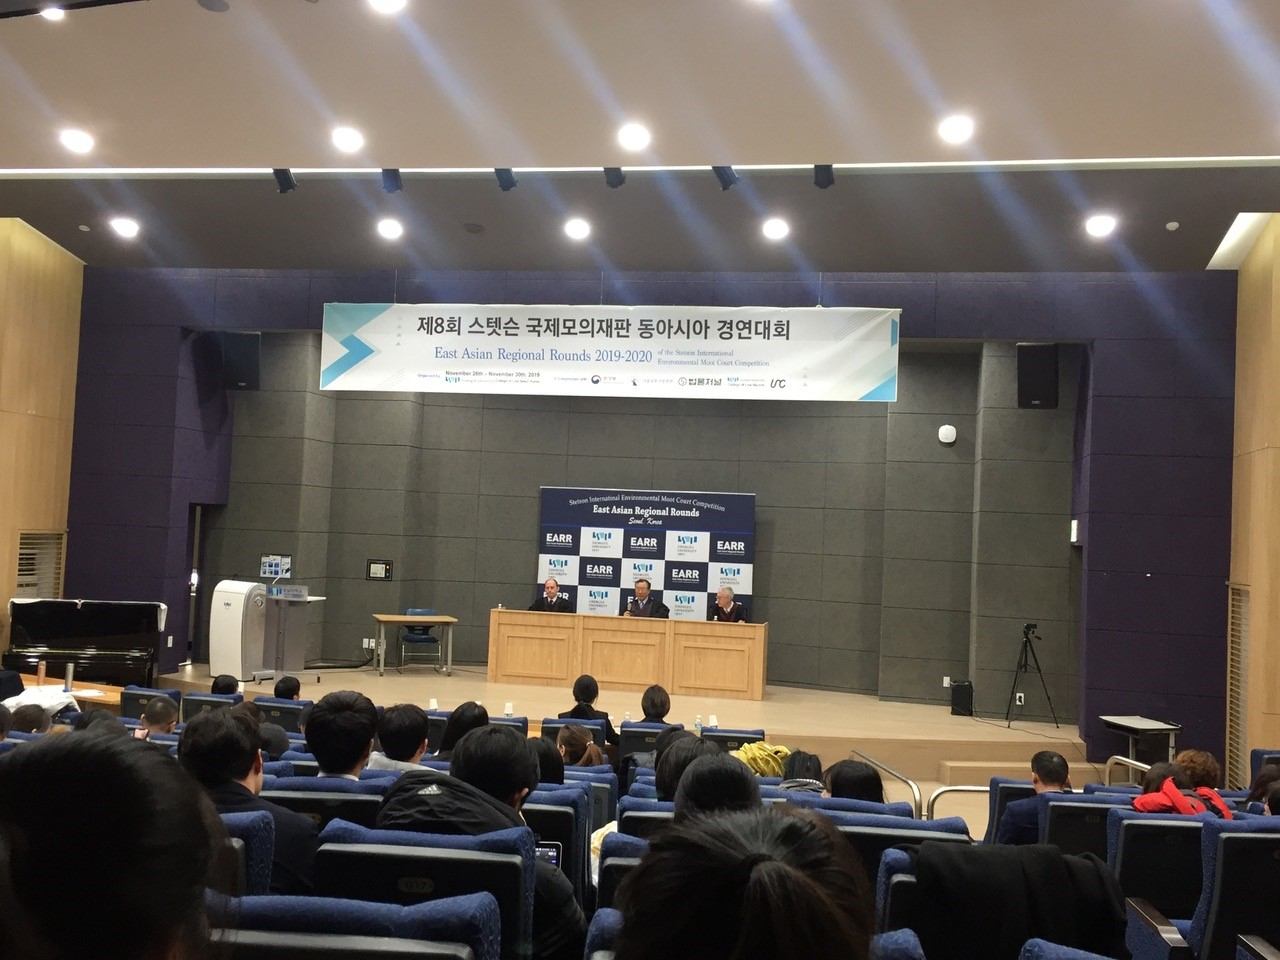 International Environmental Moot Court Competition(IEMCC)の東アジア地域ラウンド(EARR)の様子